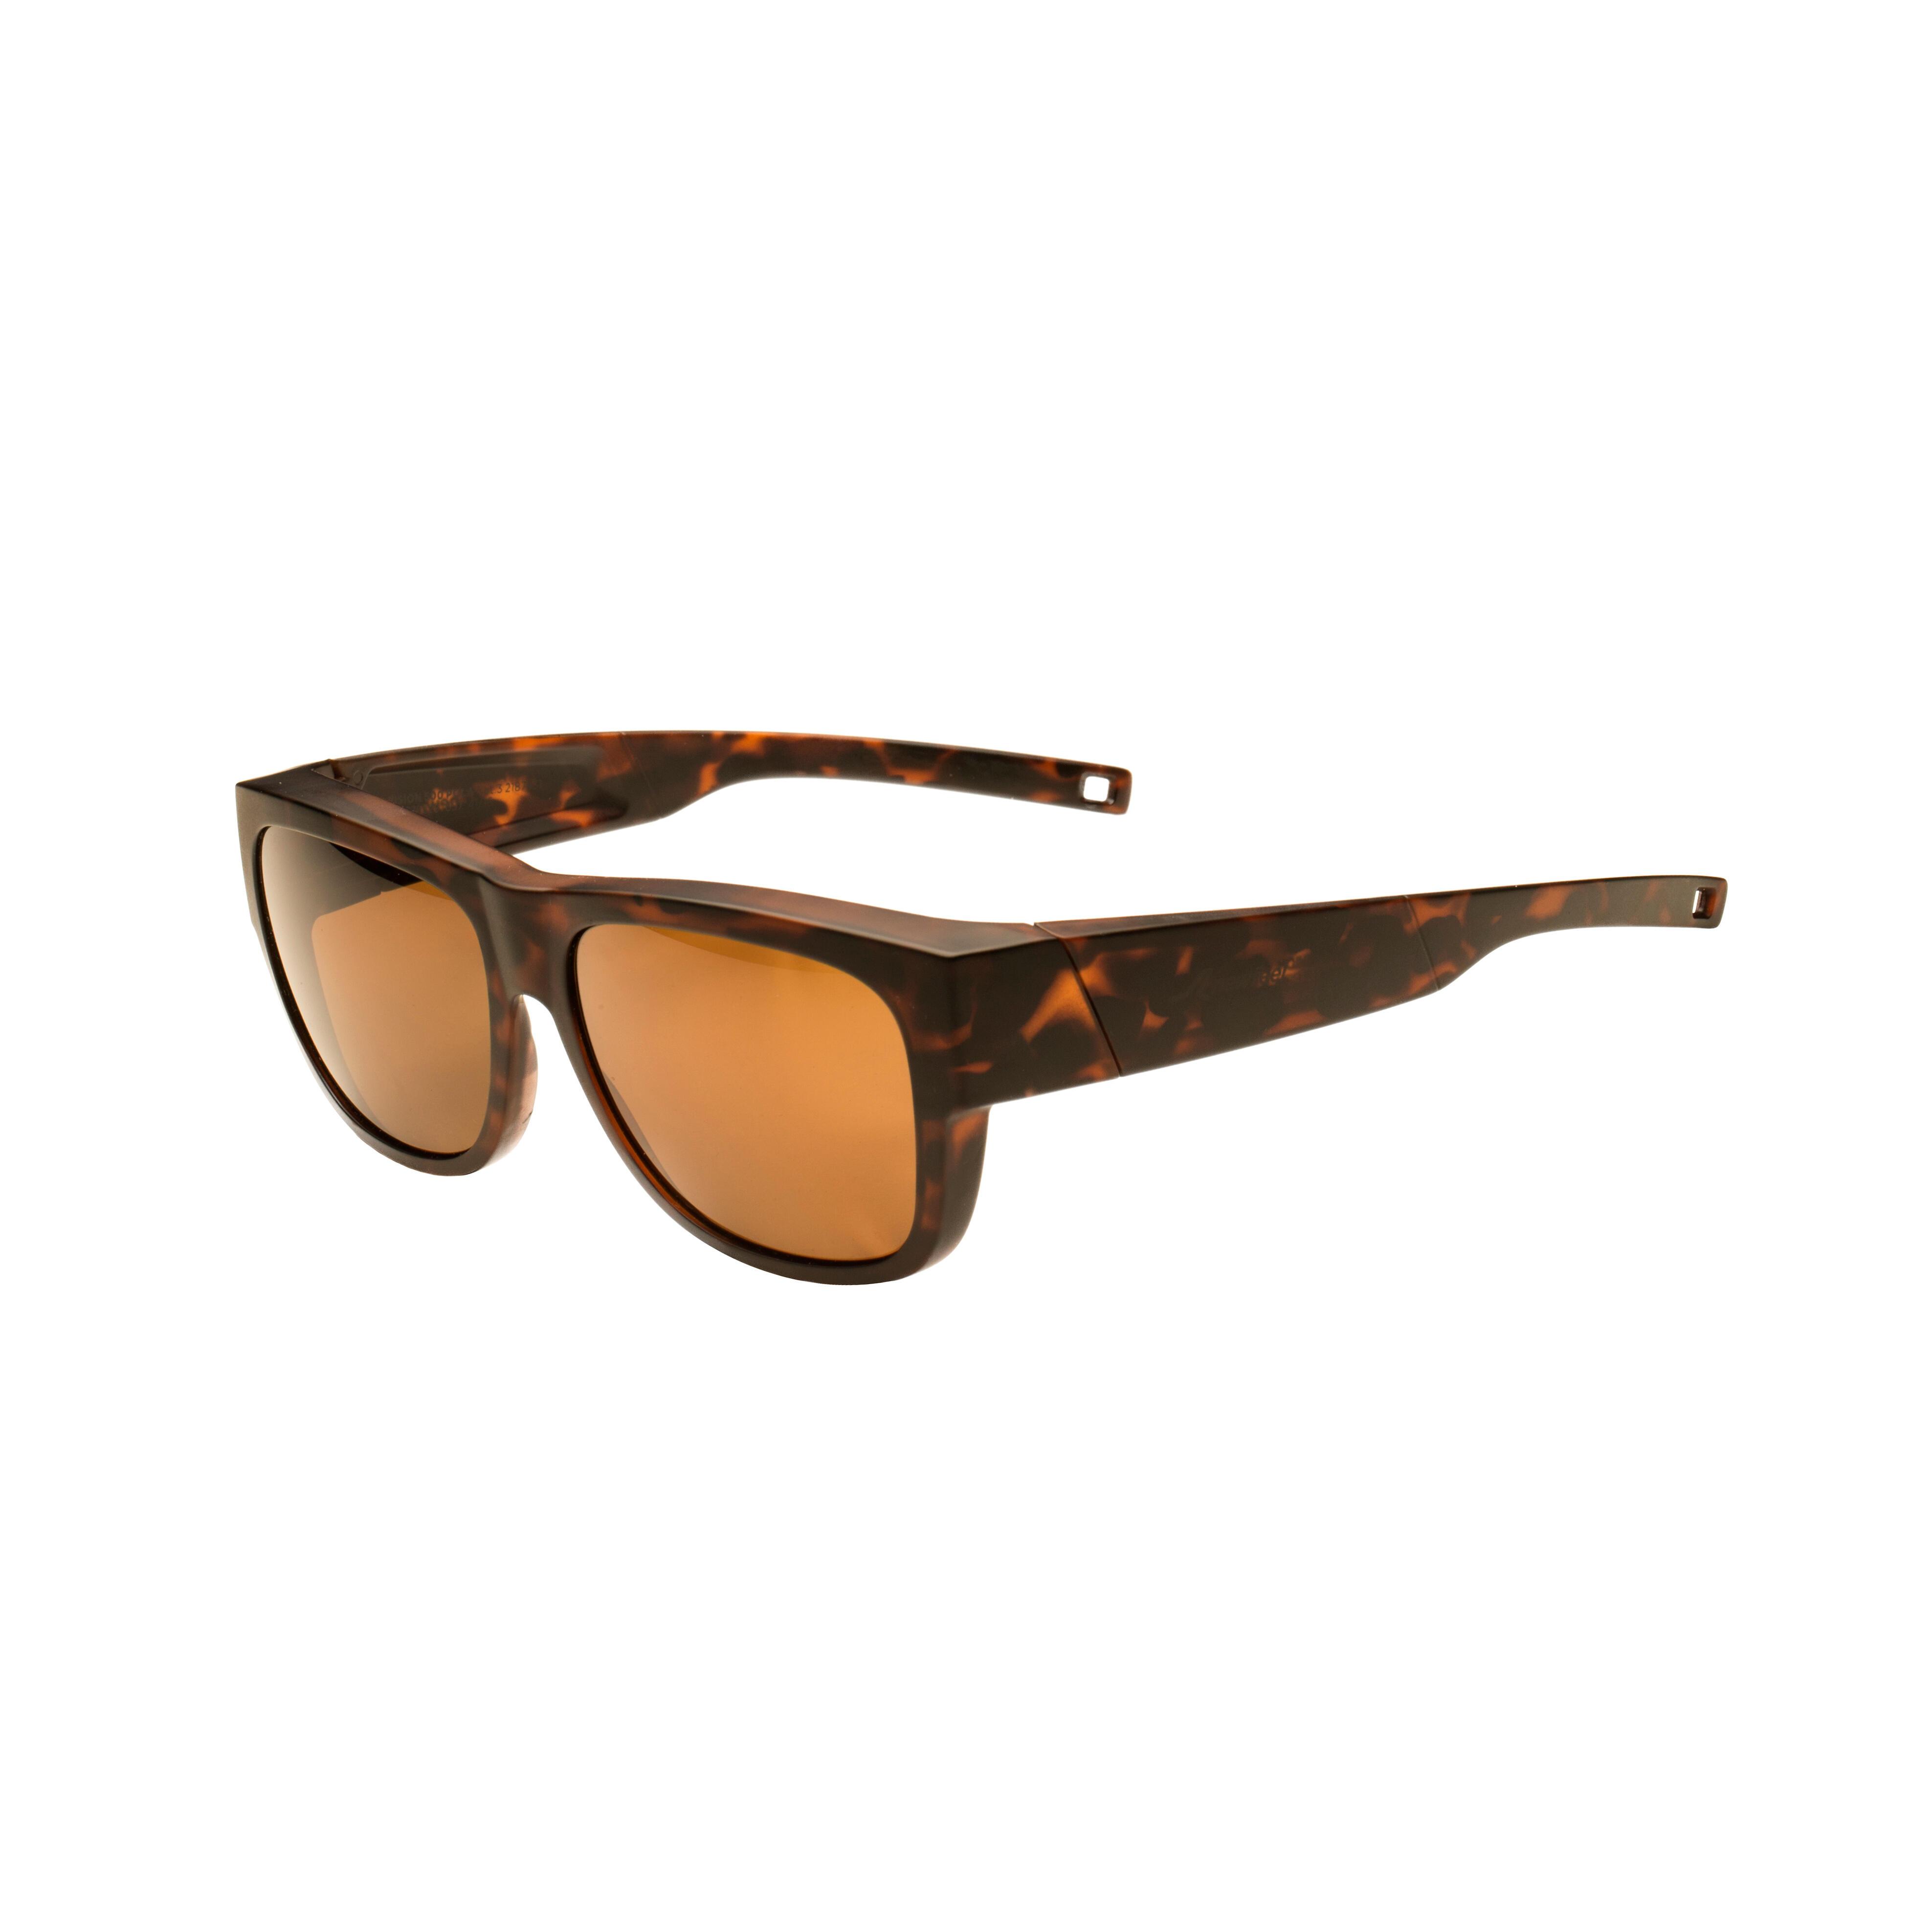 Orao Overbril Vision 500 Suncover bruin polariserende glazen categorie 3 thumbnail